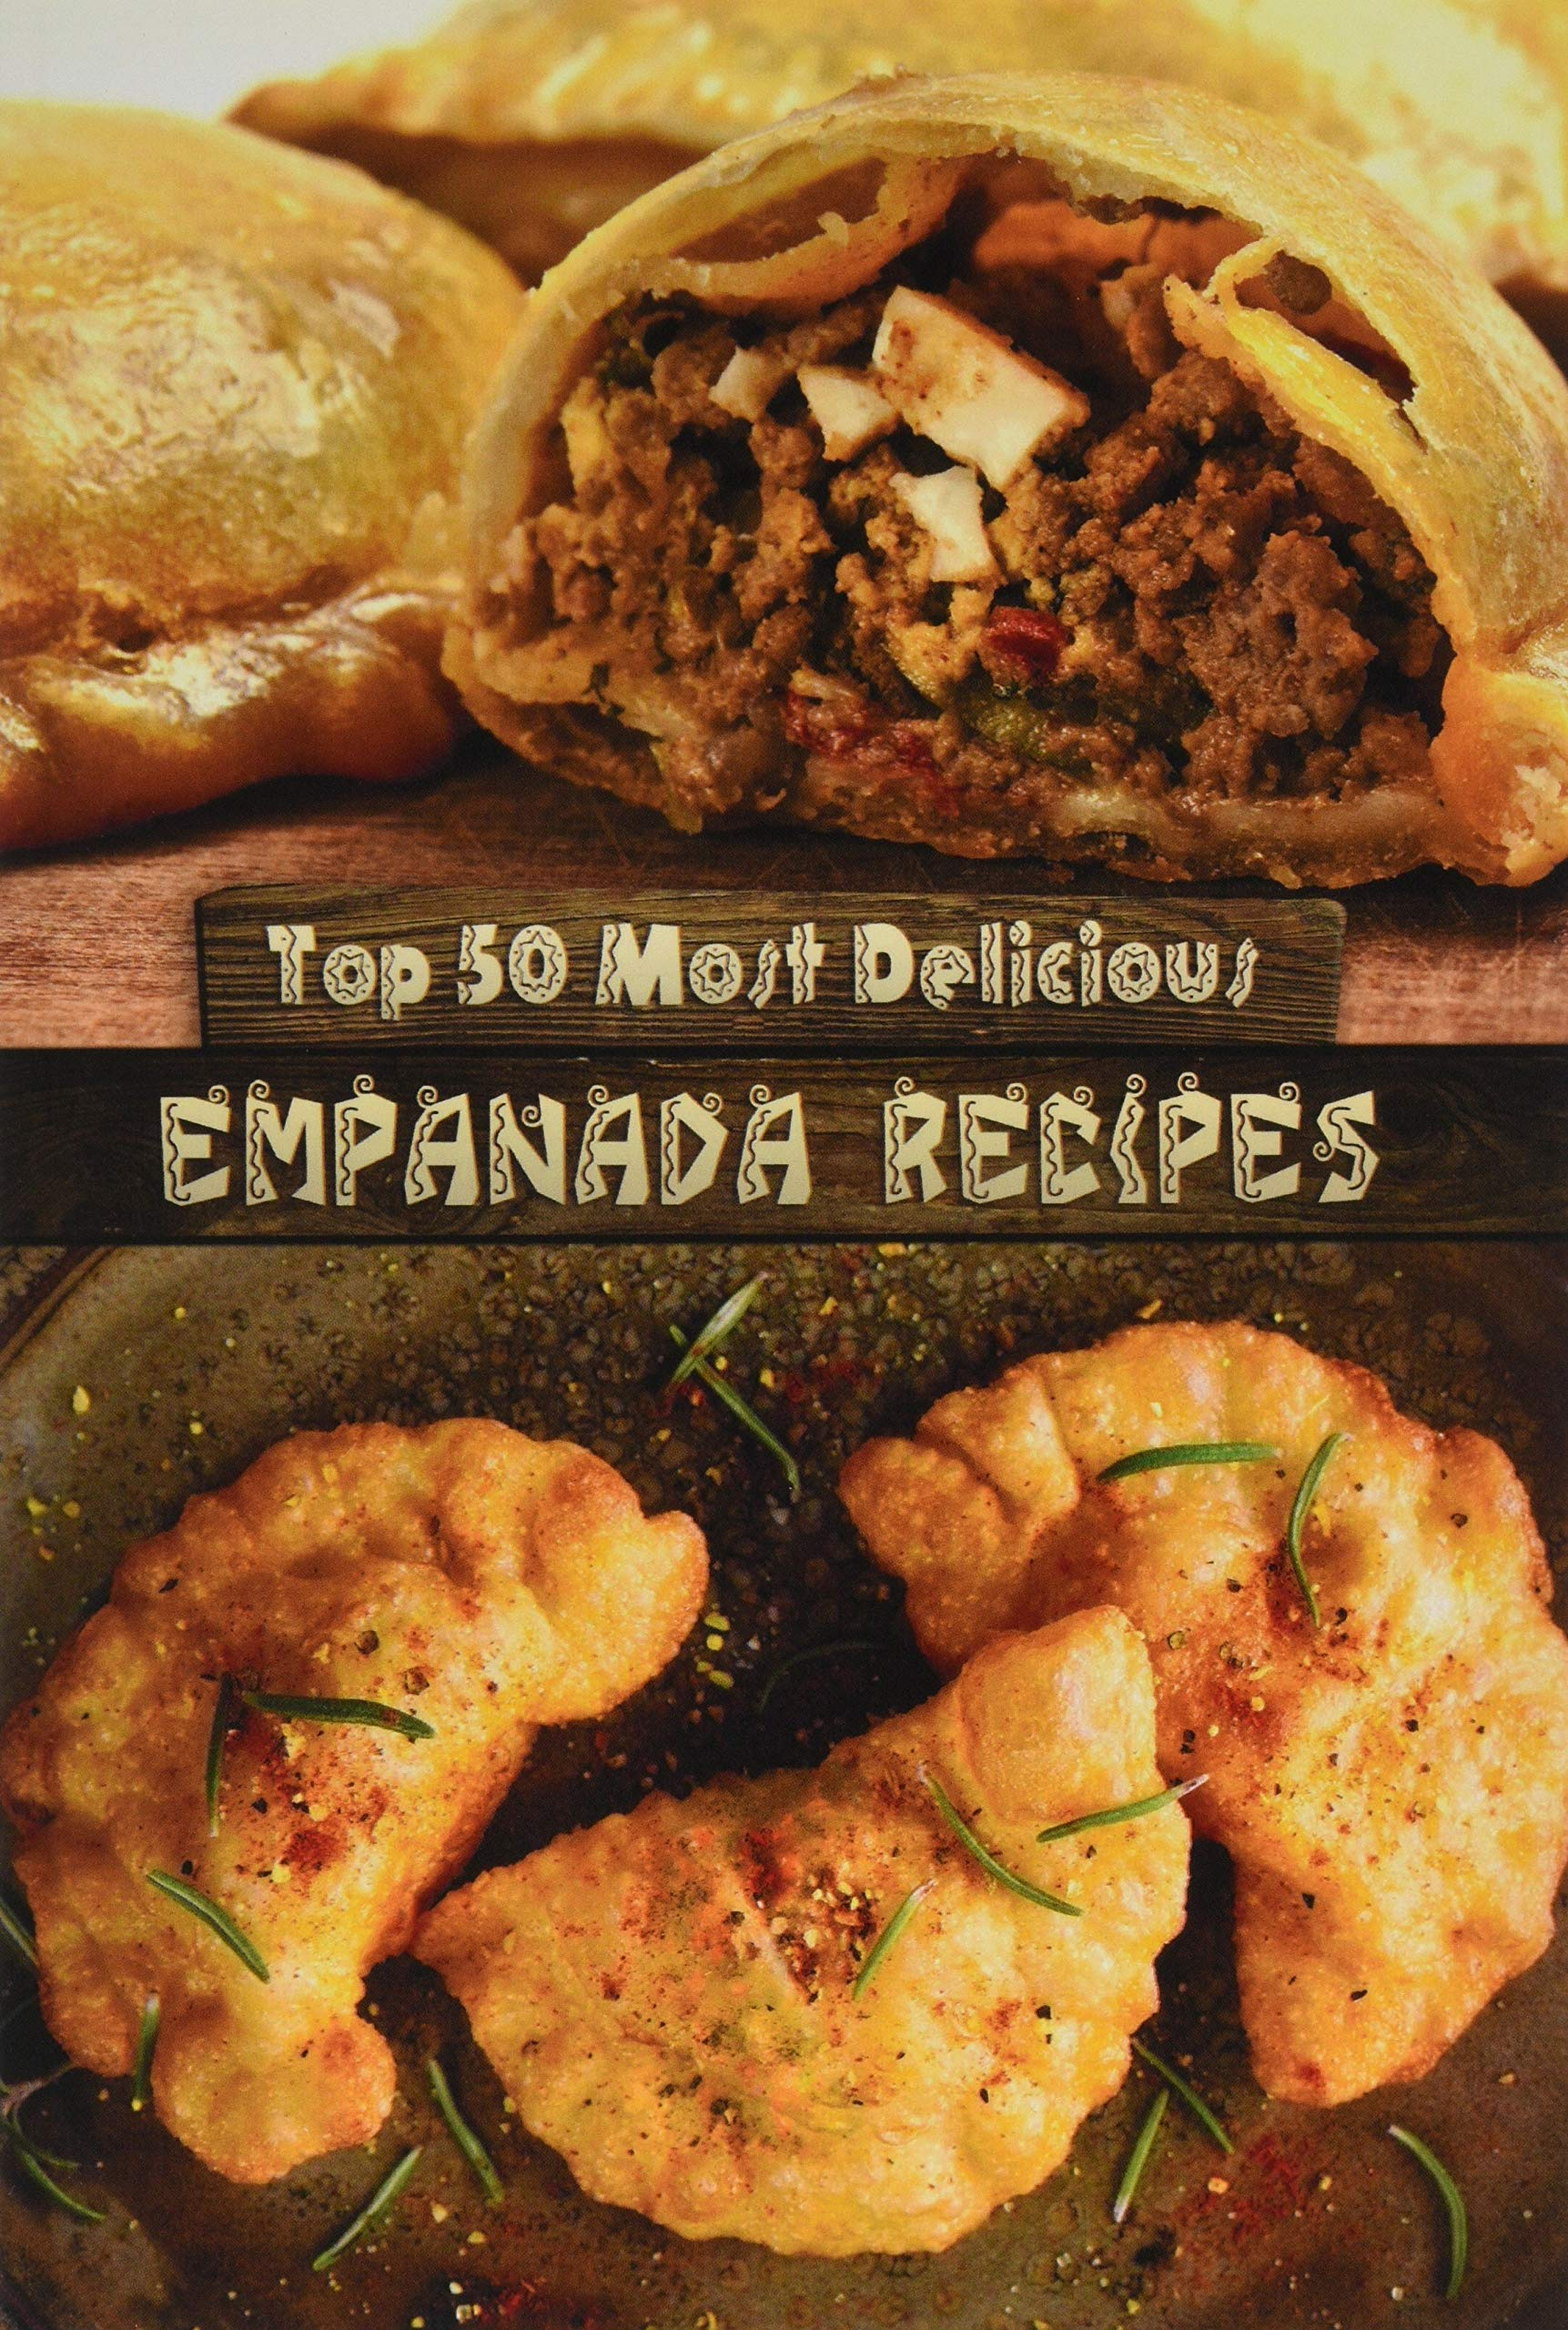 Amazon.com: Top 50 Most Delicious Empanada Recipes (Recipe ...